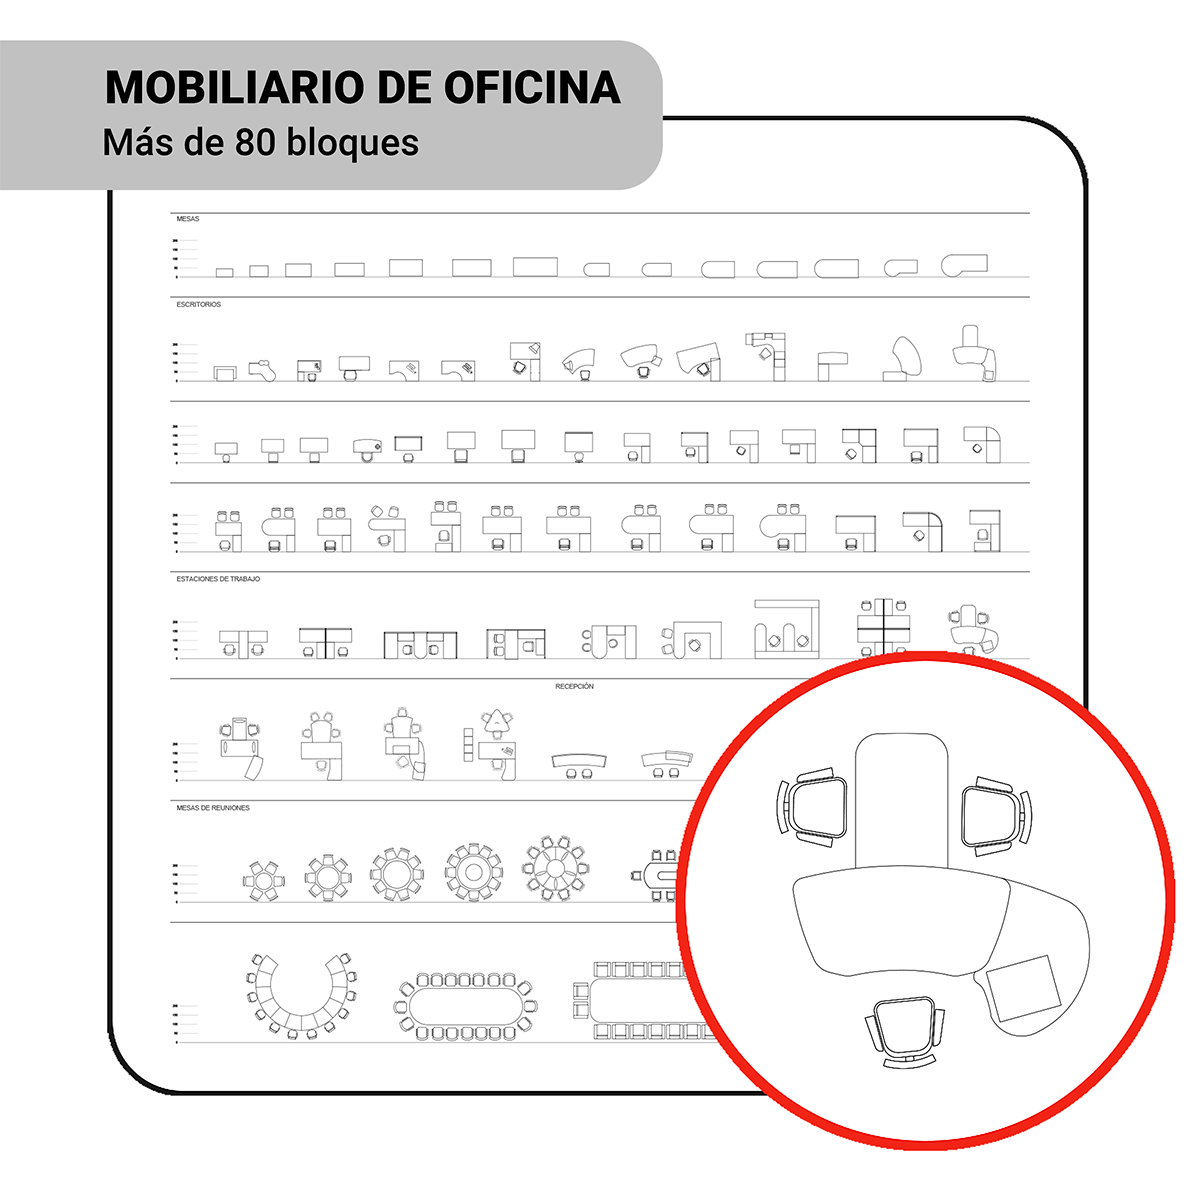 Bloques: Mobiliario de Oficina